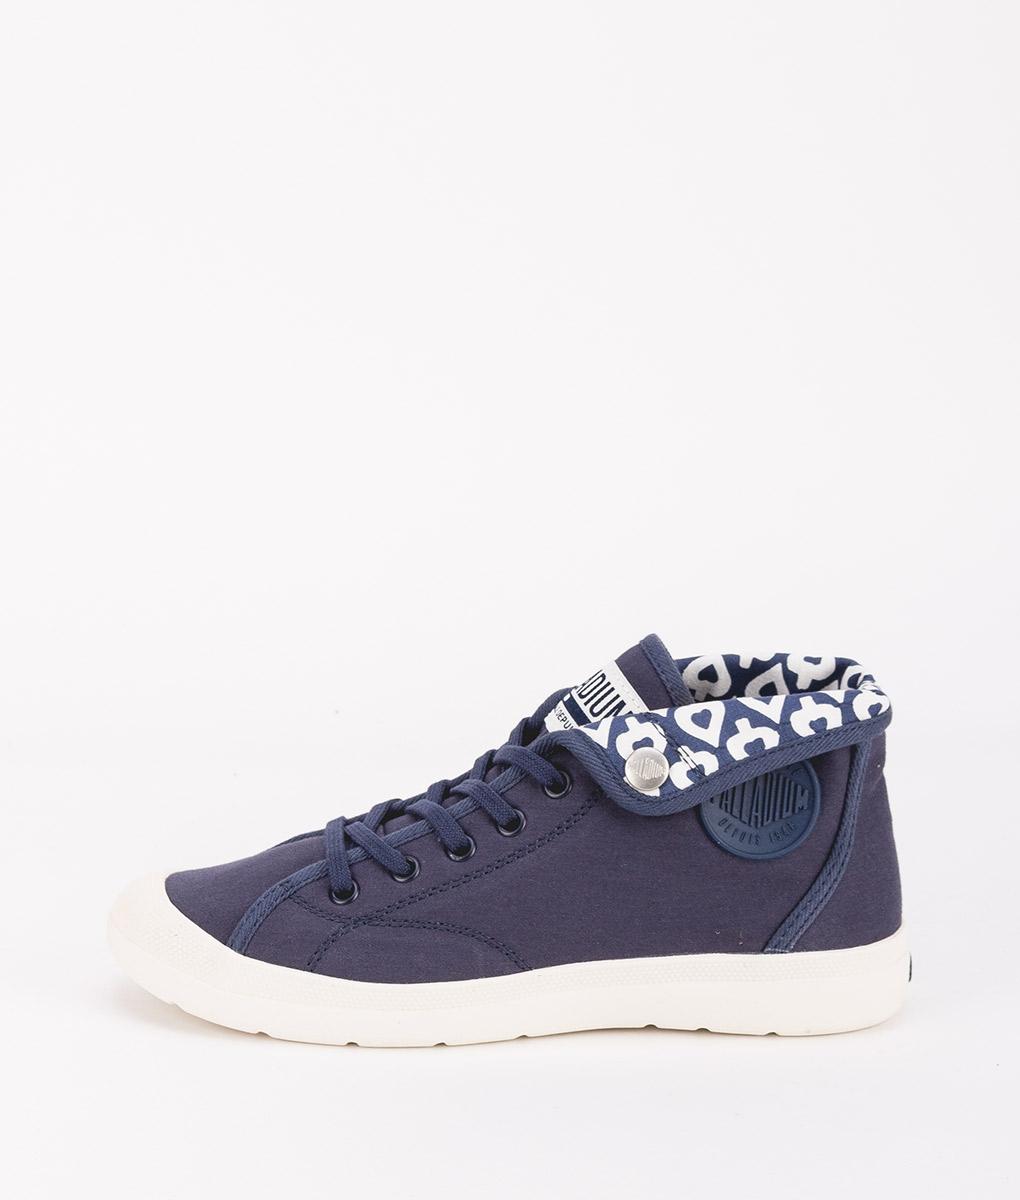 PALLADIUM Women Sneakers 95680 AVENTURE, Mood Indigo Marshmellow 69.99